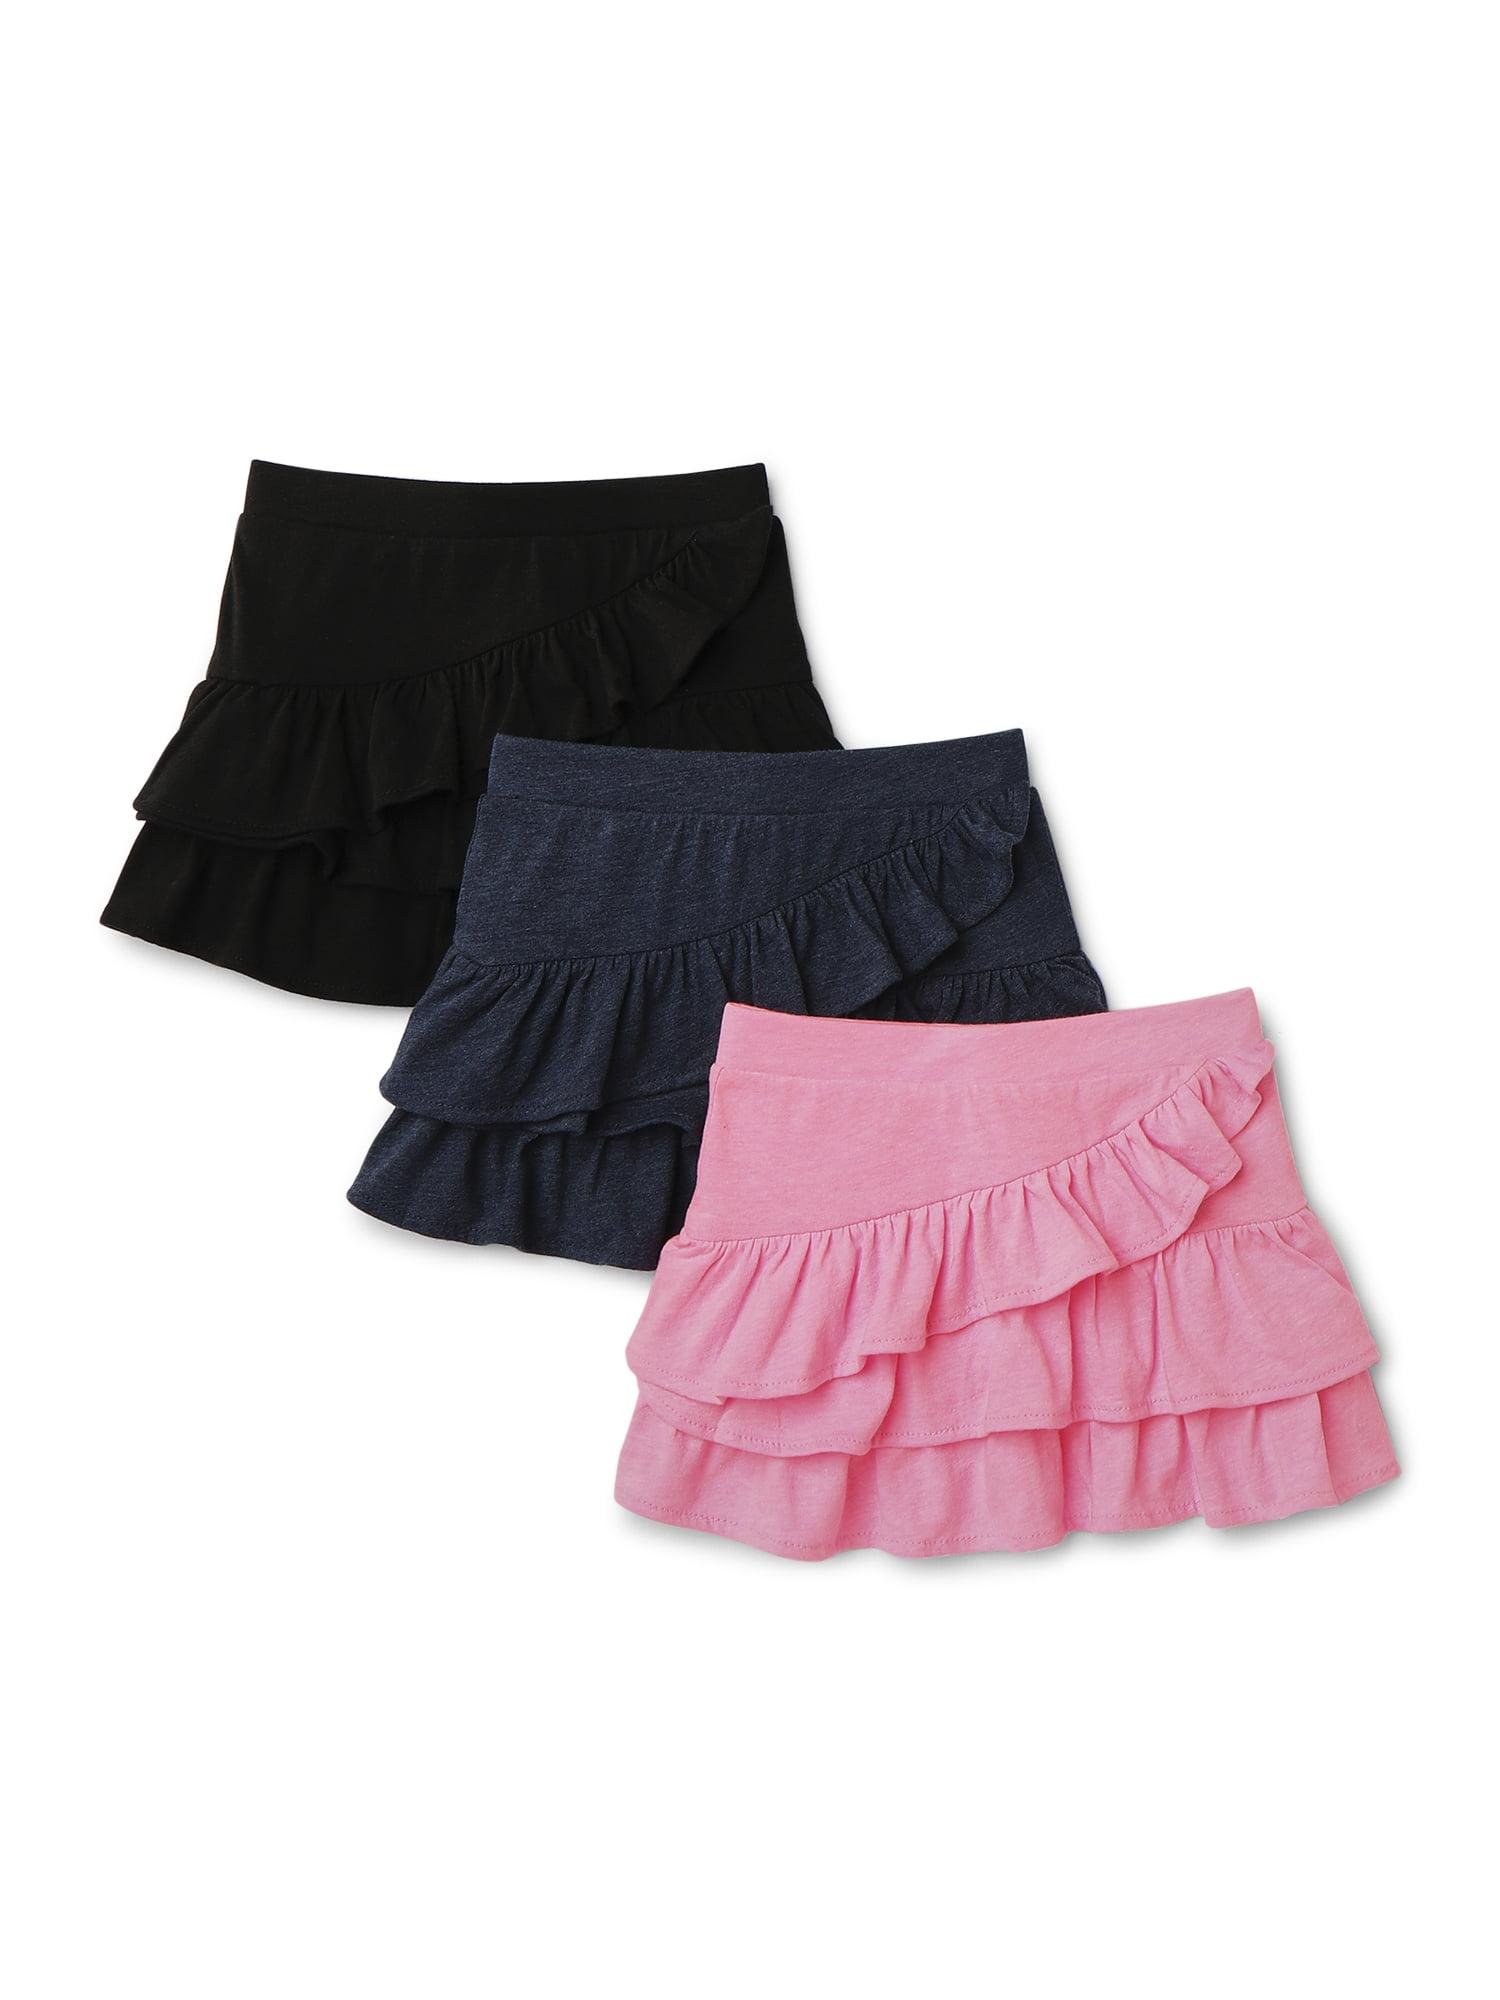 Big Girls Hunter Stylish BASIC Essential Dancewear Mesh Wrap Skirt 12-14